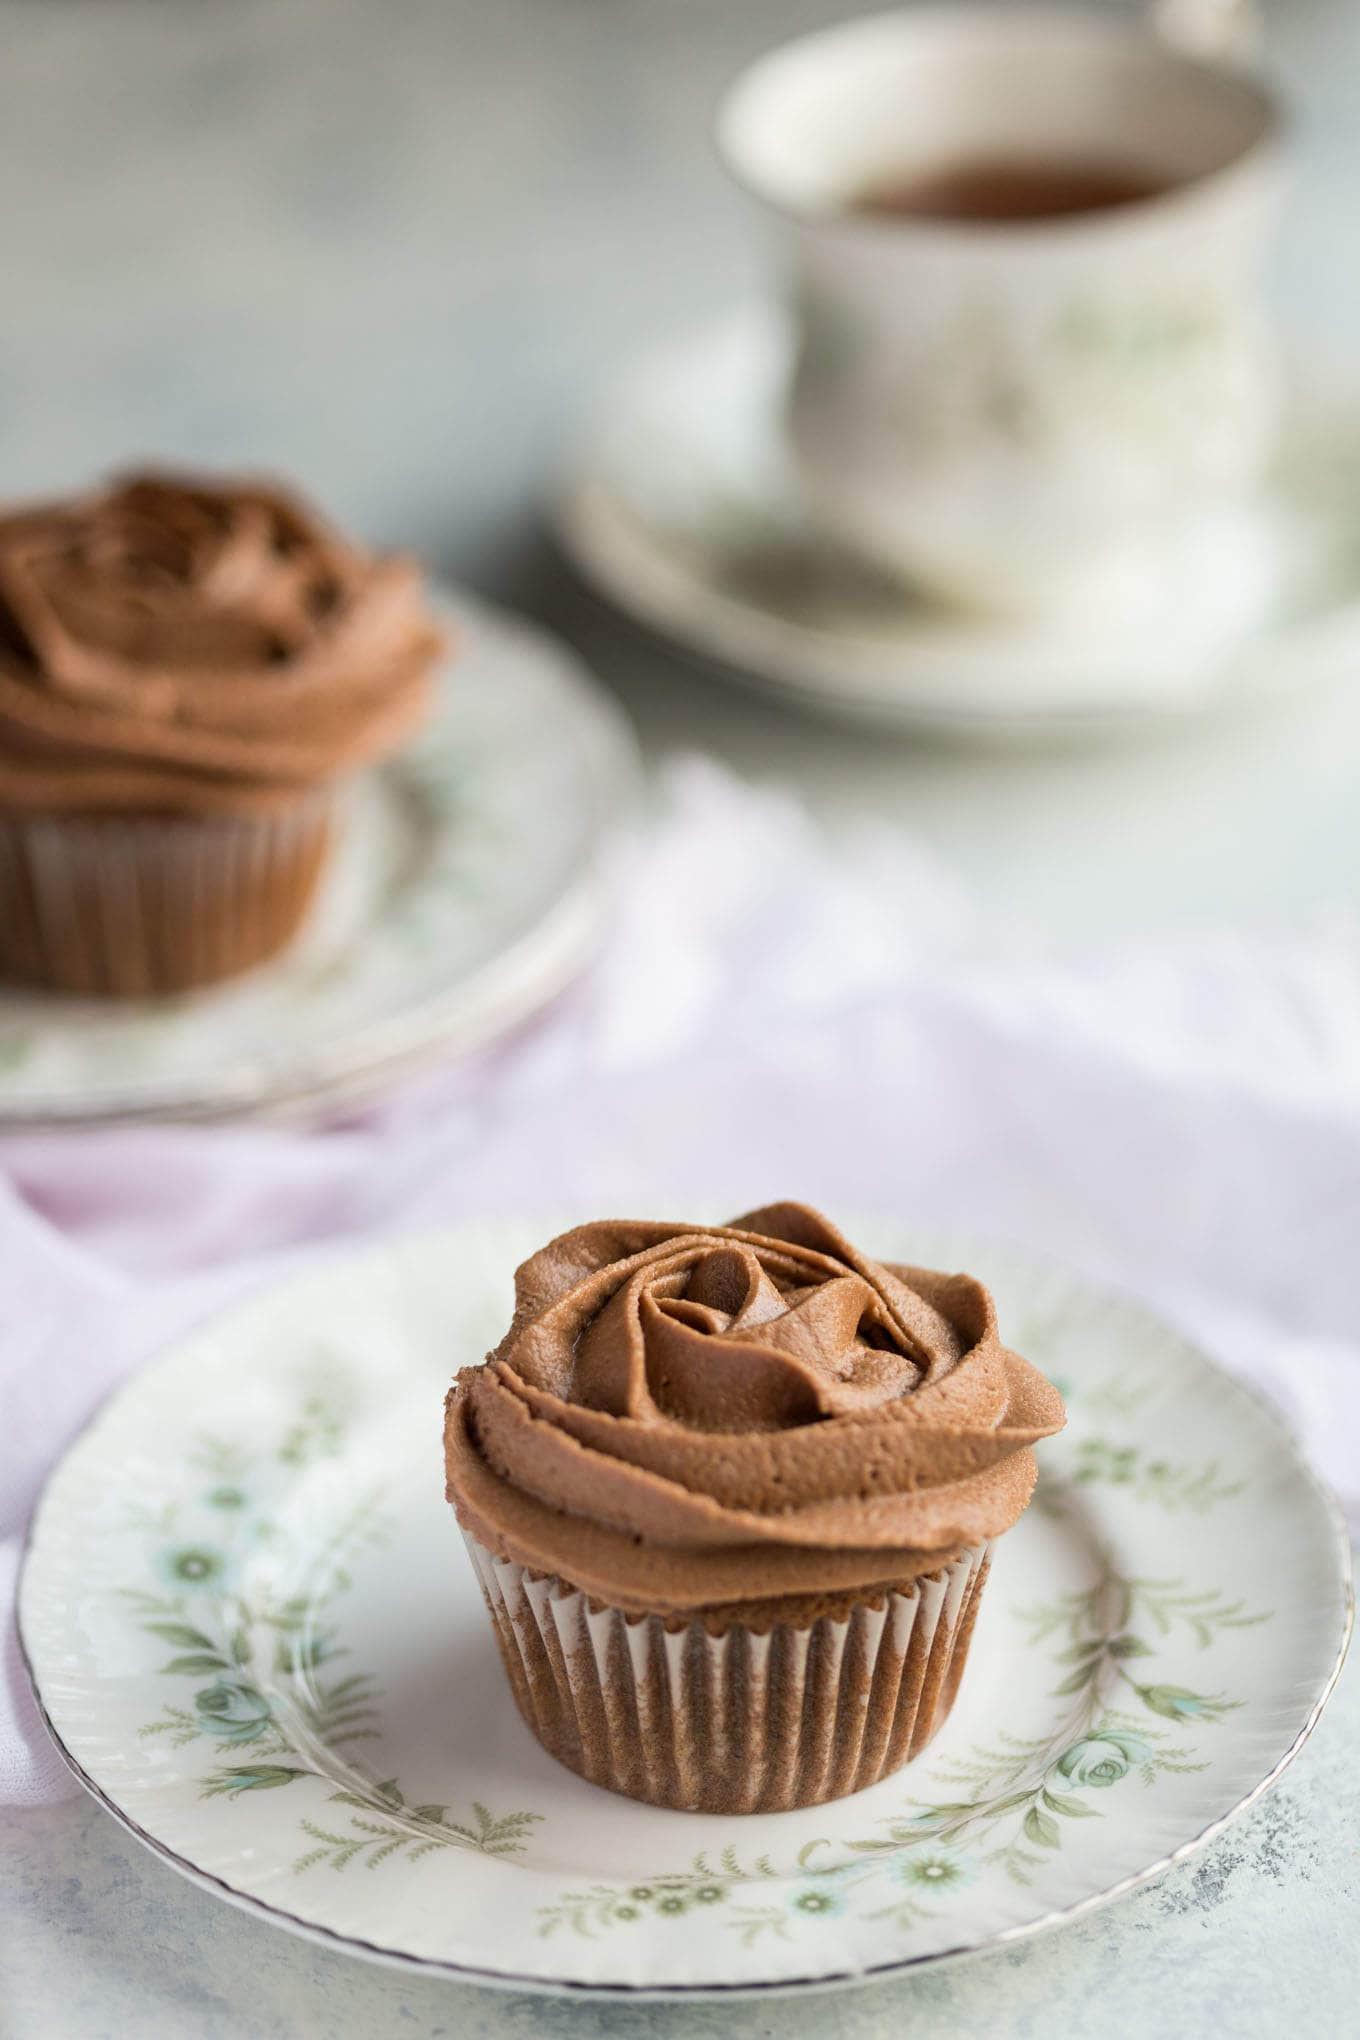 Gluten Free Cupcakes Recipe  Gluten Free Chocolate Cupcake Recipe